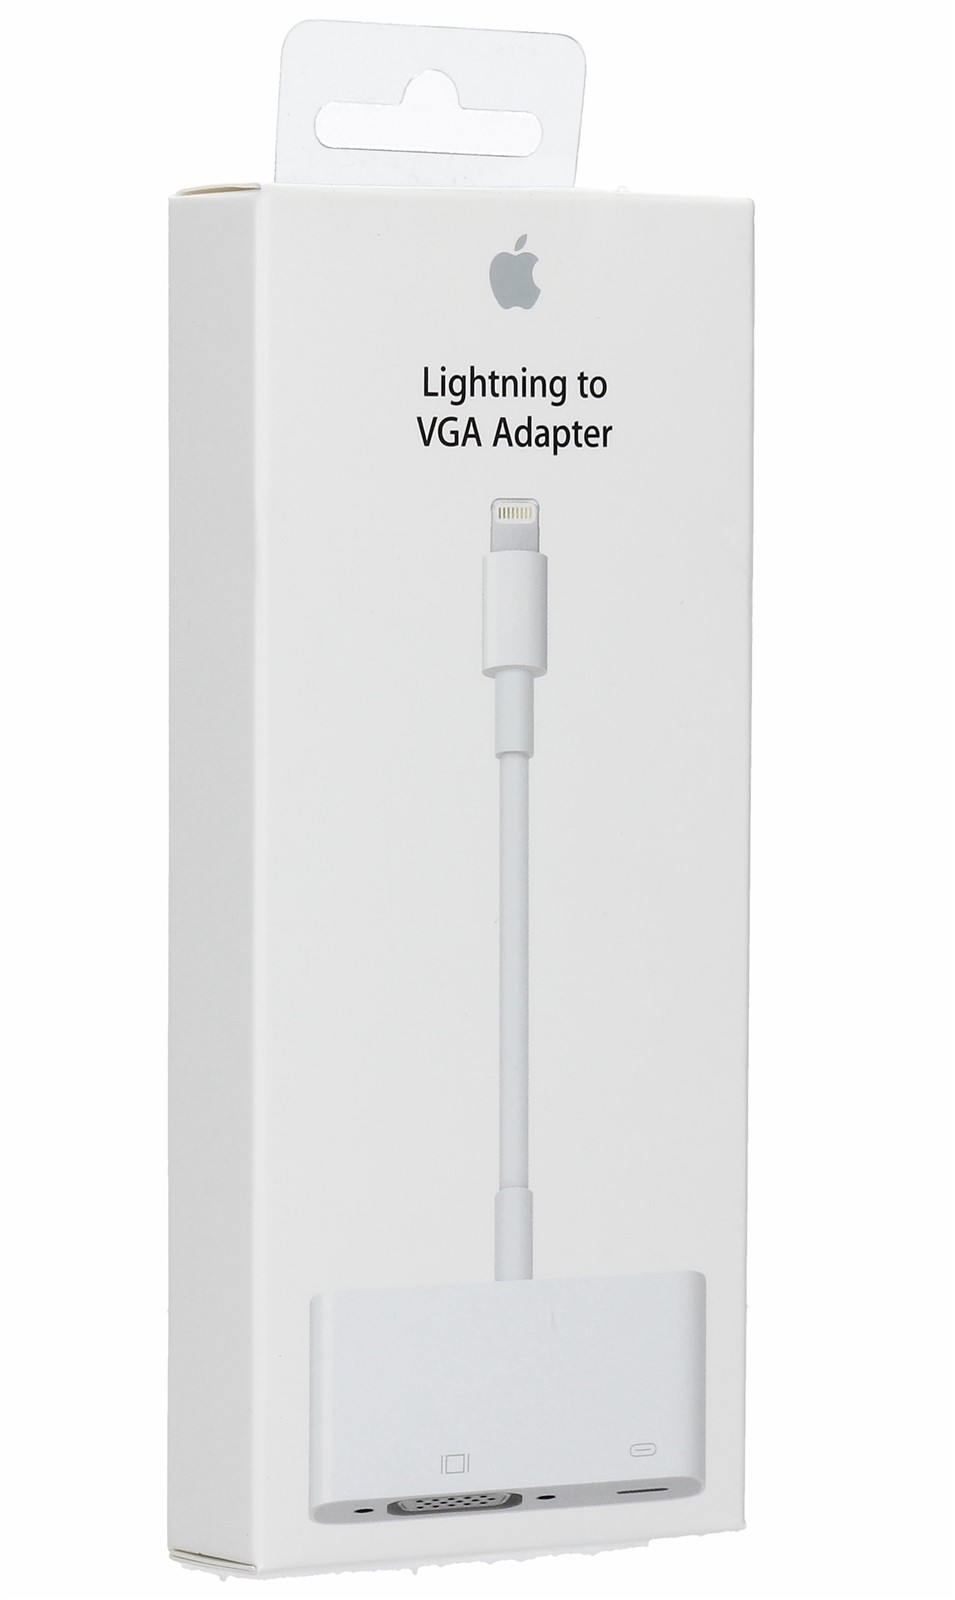 Lightning apple